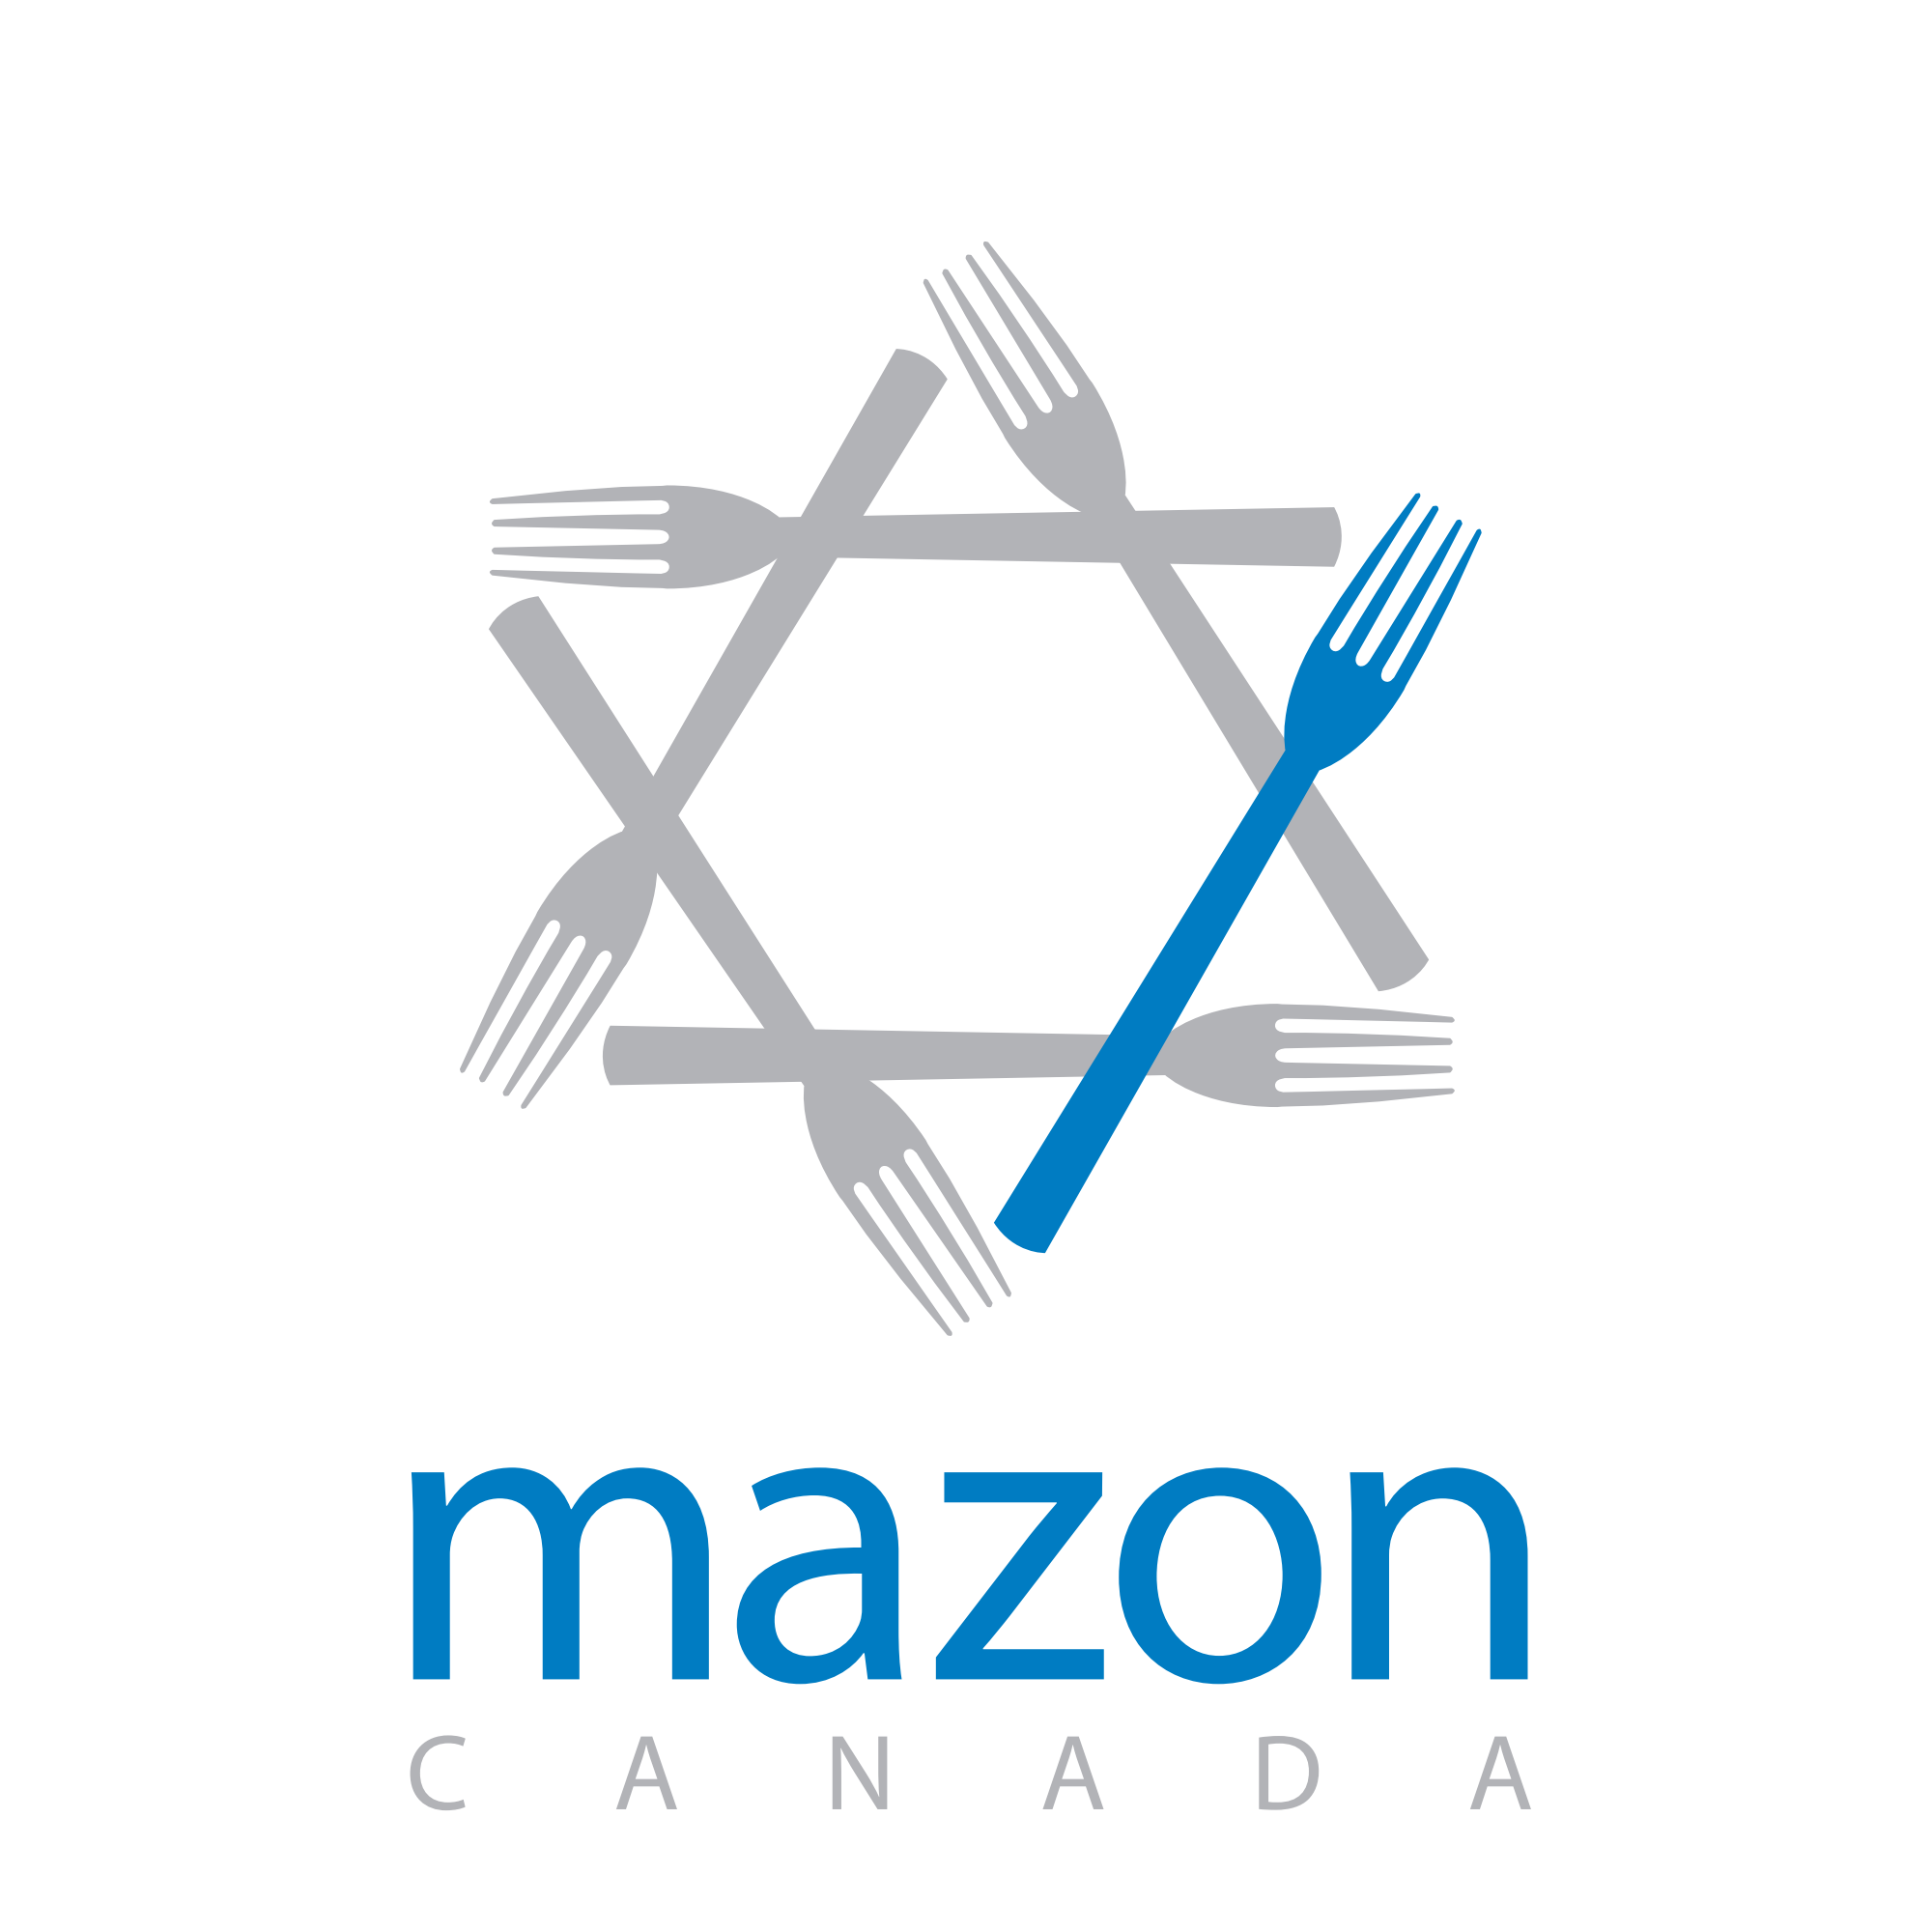 Mazon-logo.png